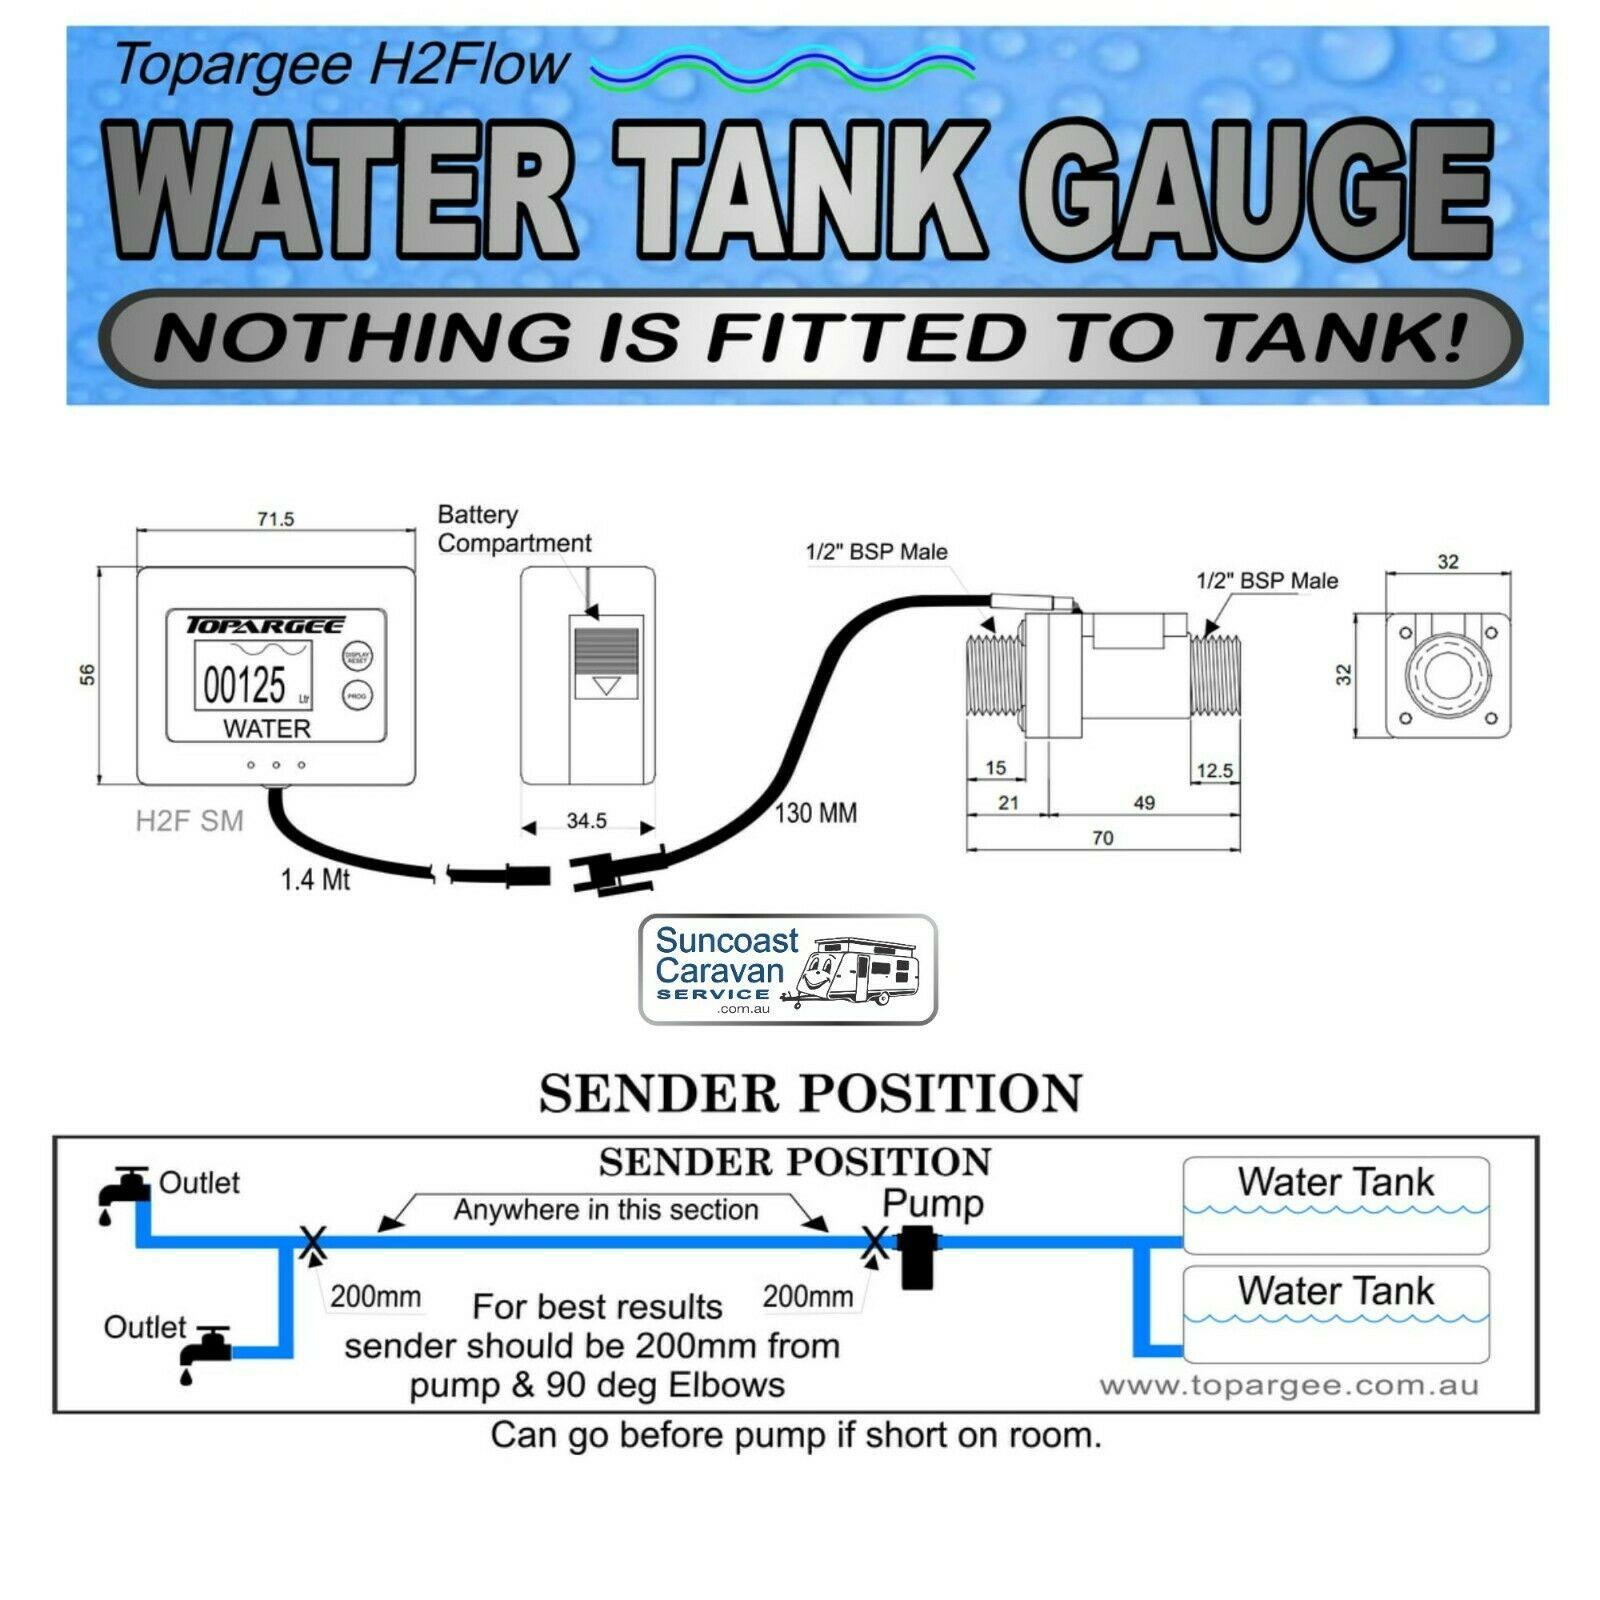 Topargee Flush Mount Water Tank Gauge RV + 1 4 mt Extension